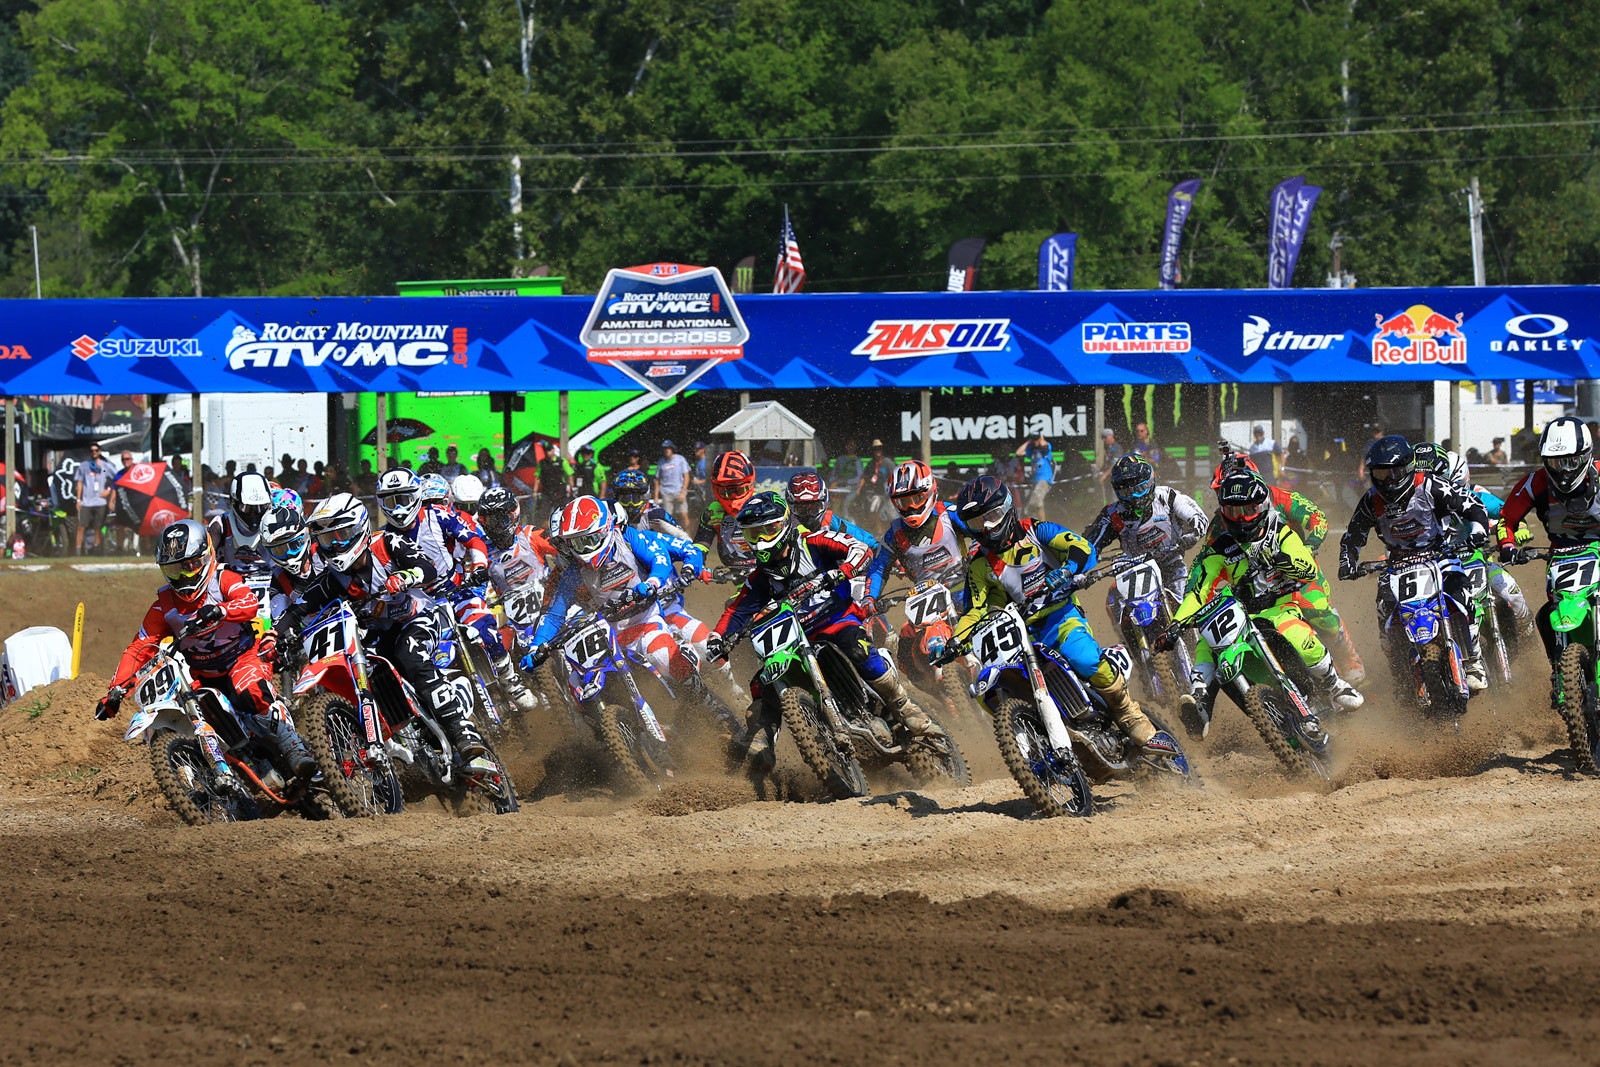 Open Pro Sport - Day 1: 2015 Rocky Mountain ATV/MC AMA Amateur National Motocross Championships  - Motocross Pictures - Vital MX